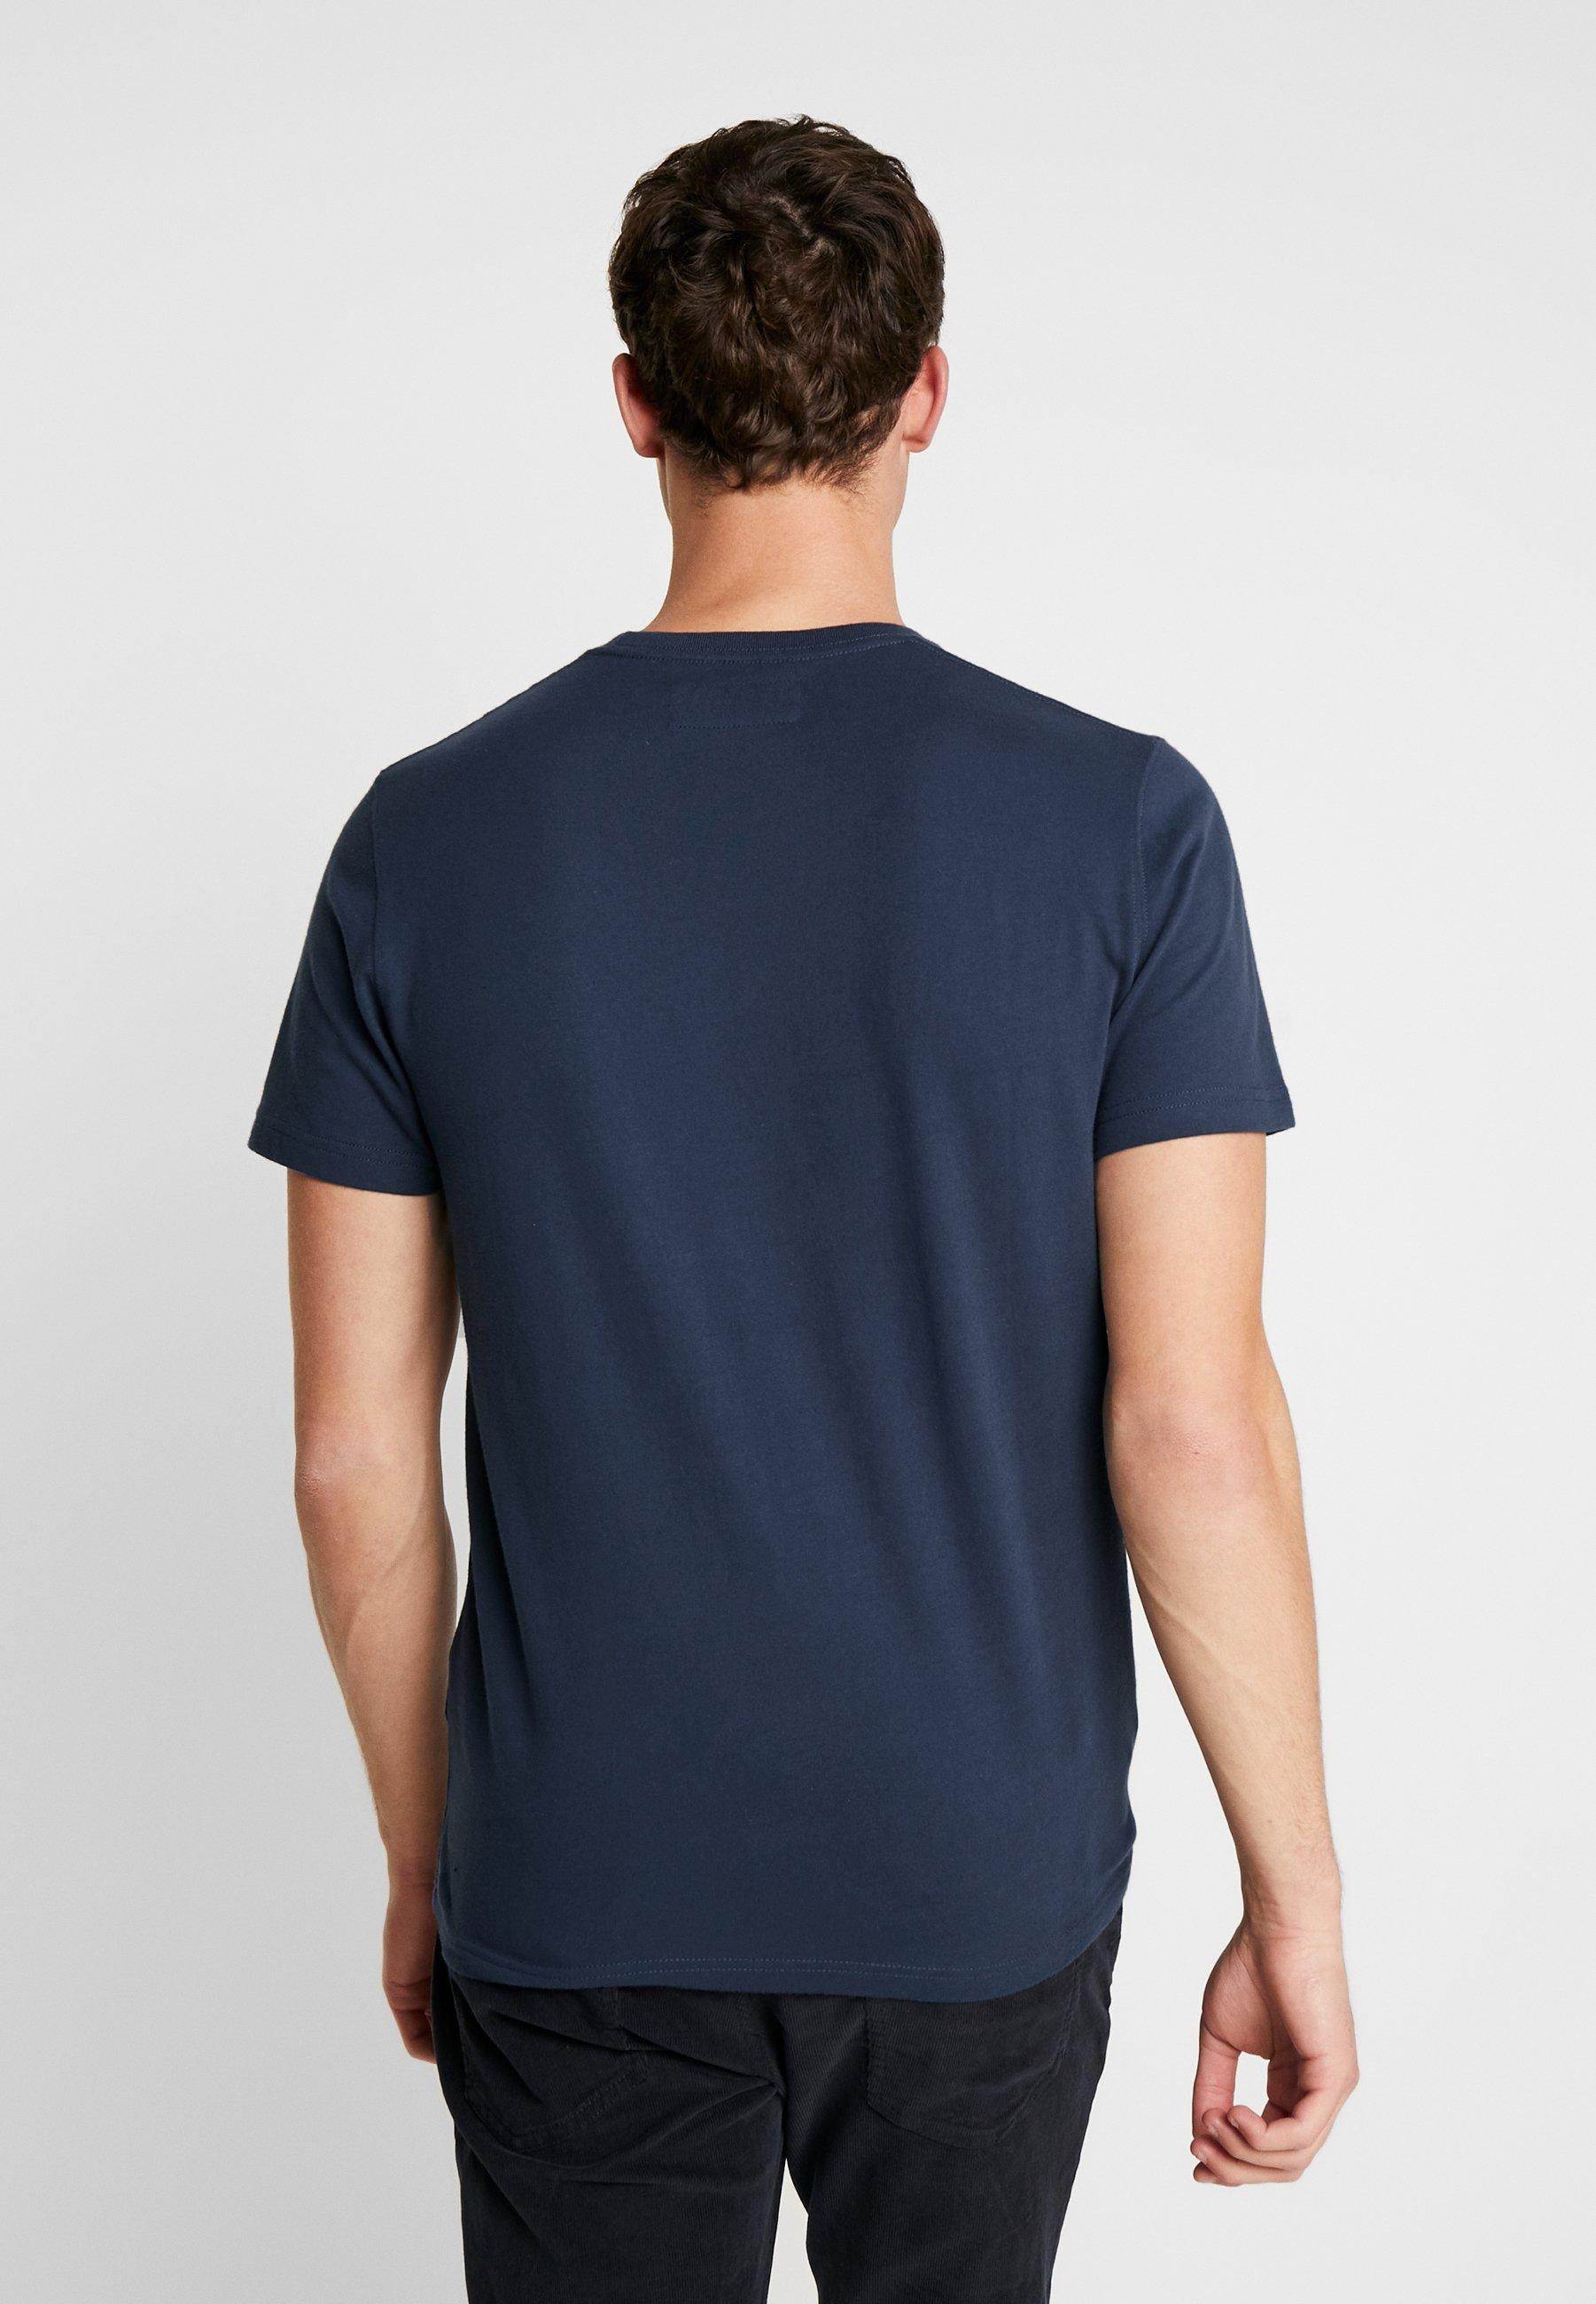 Fitch APPLIQUET HOLIDAY Shirt Abercrombieamp; print navy F1lJuKTc3